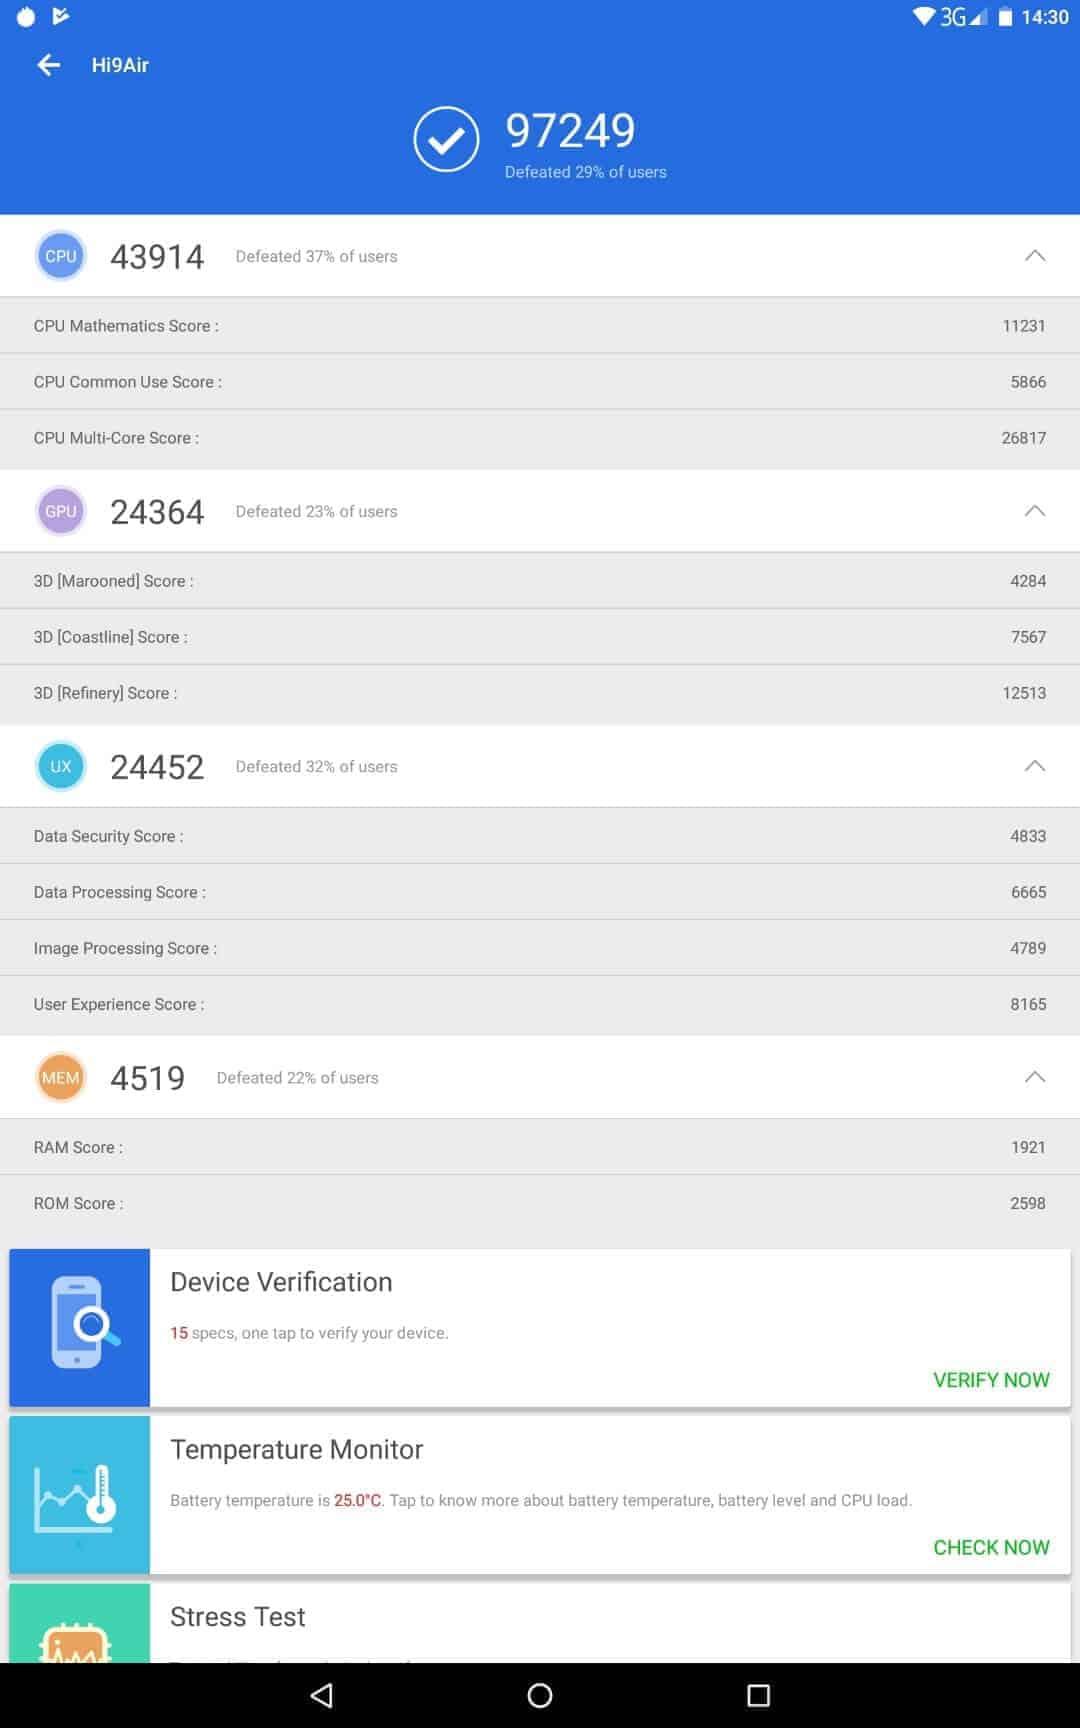 Chuwi Hi9 Air Review Screenshot Bench Results 06